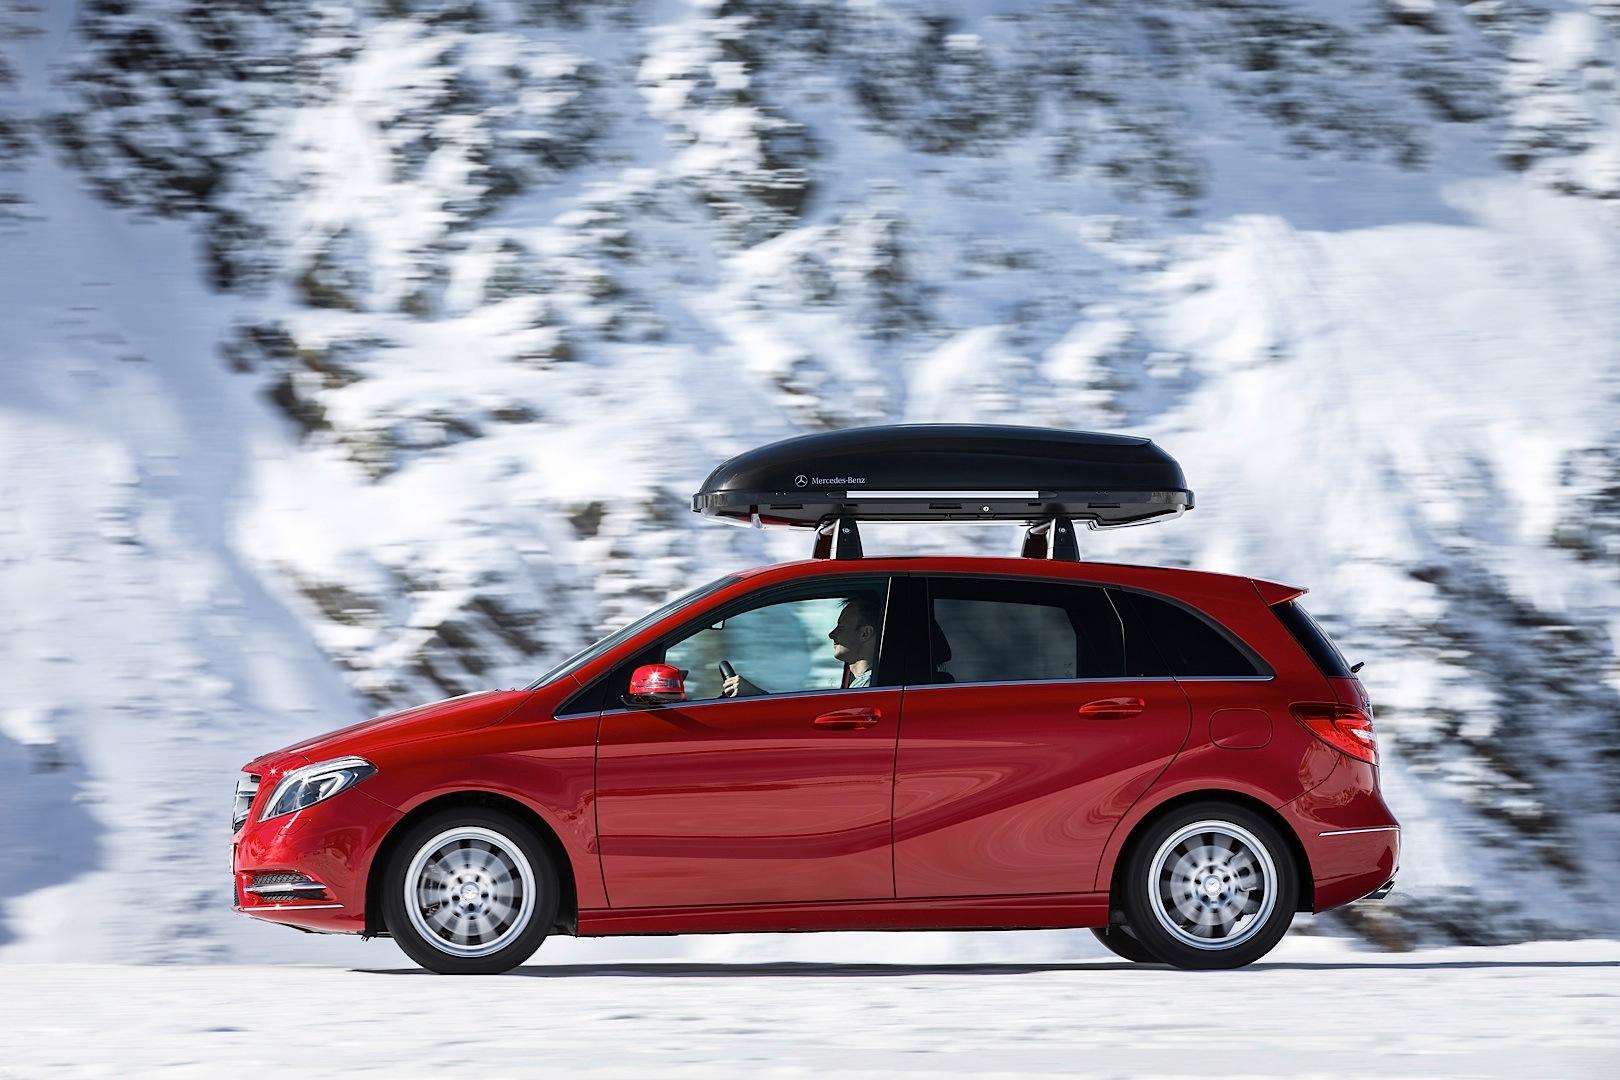 Mercedes benz launches 2013 winter accessories autoevolution for Mercedes benz store online